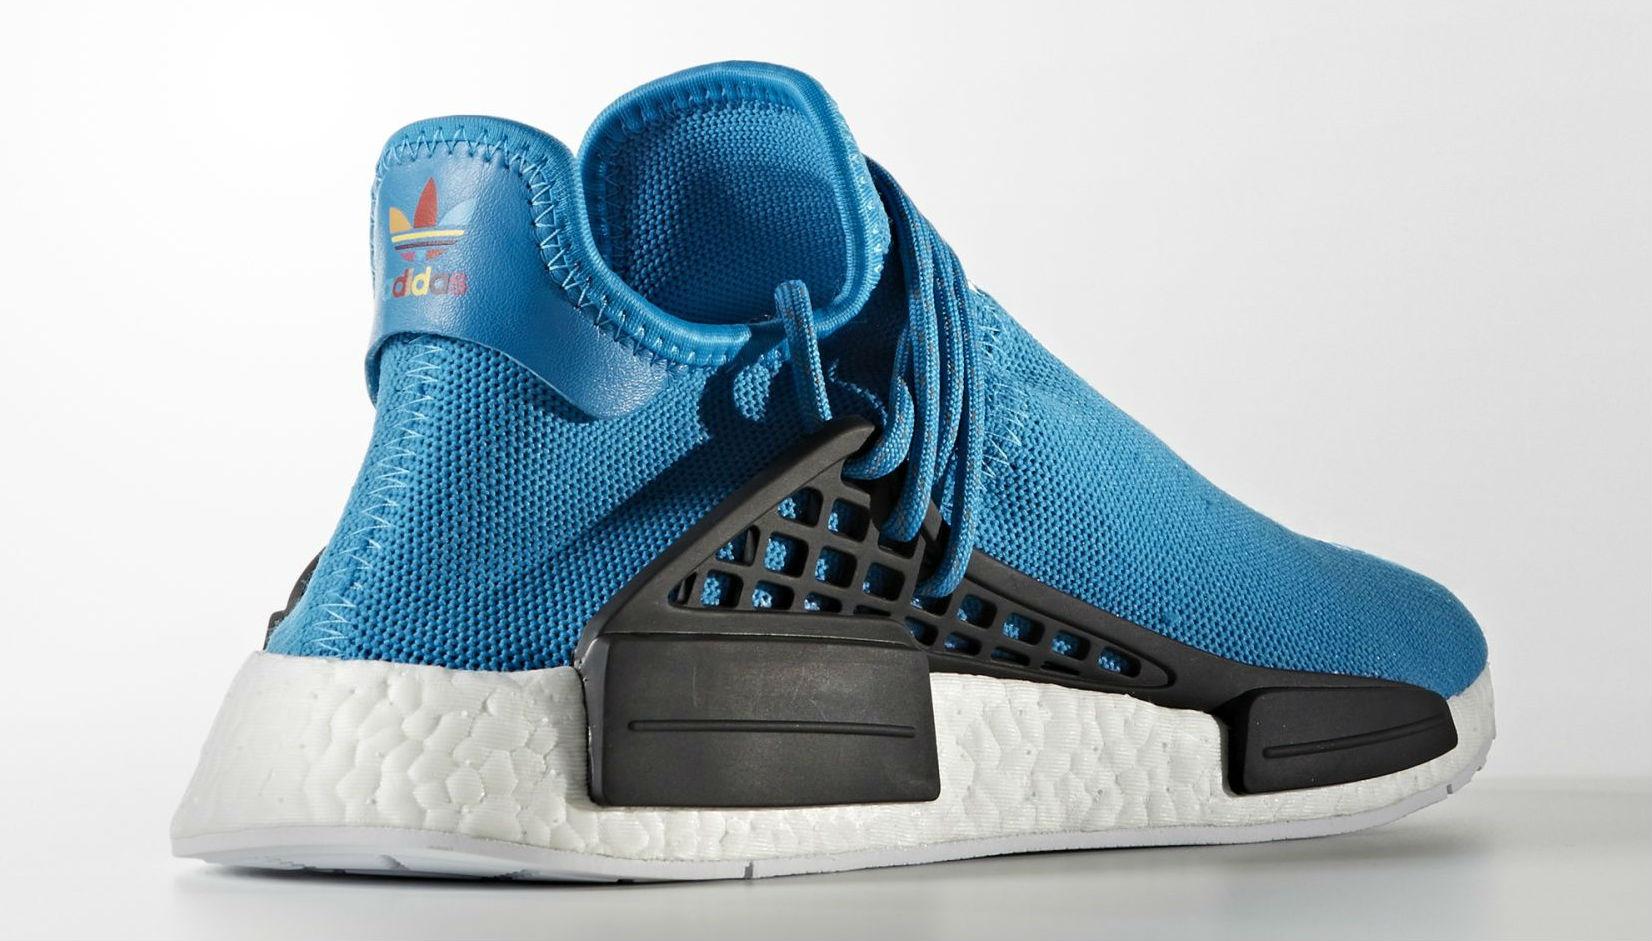 Blue Pharrell adidas NMD Human Race Lateral